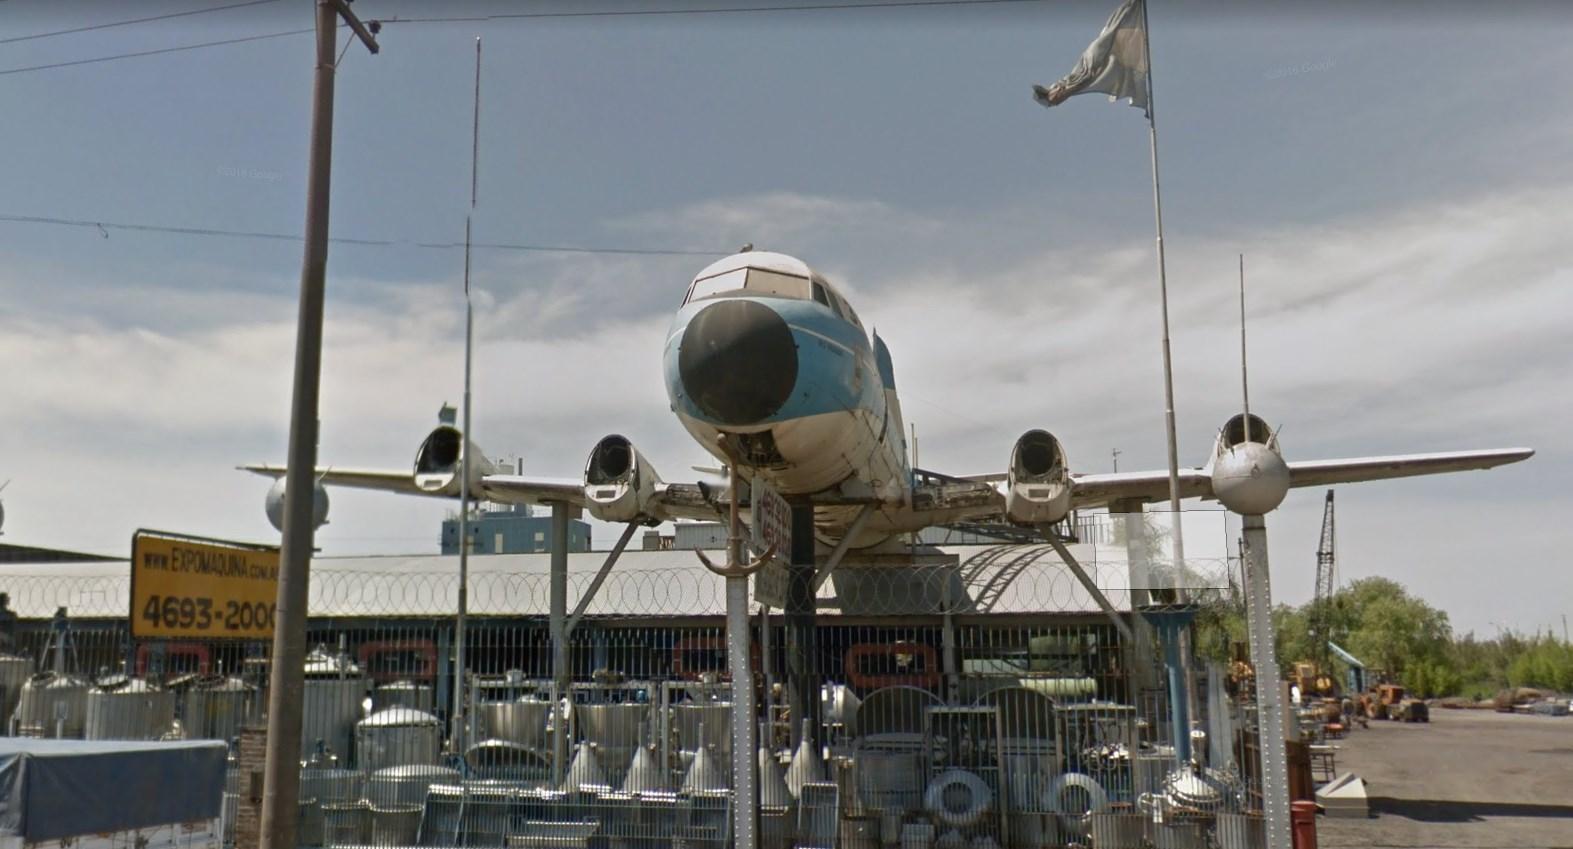 avion-de-frente.jpg